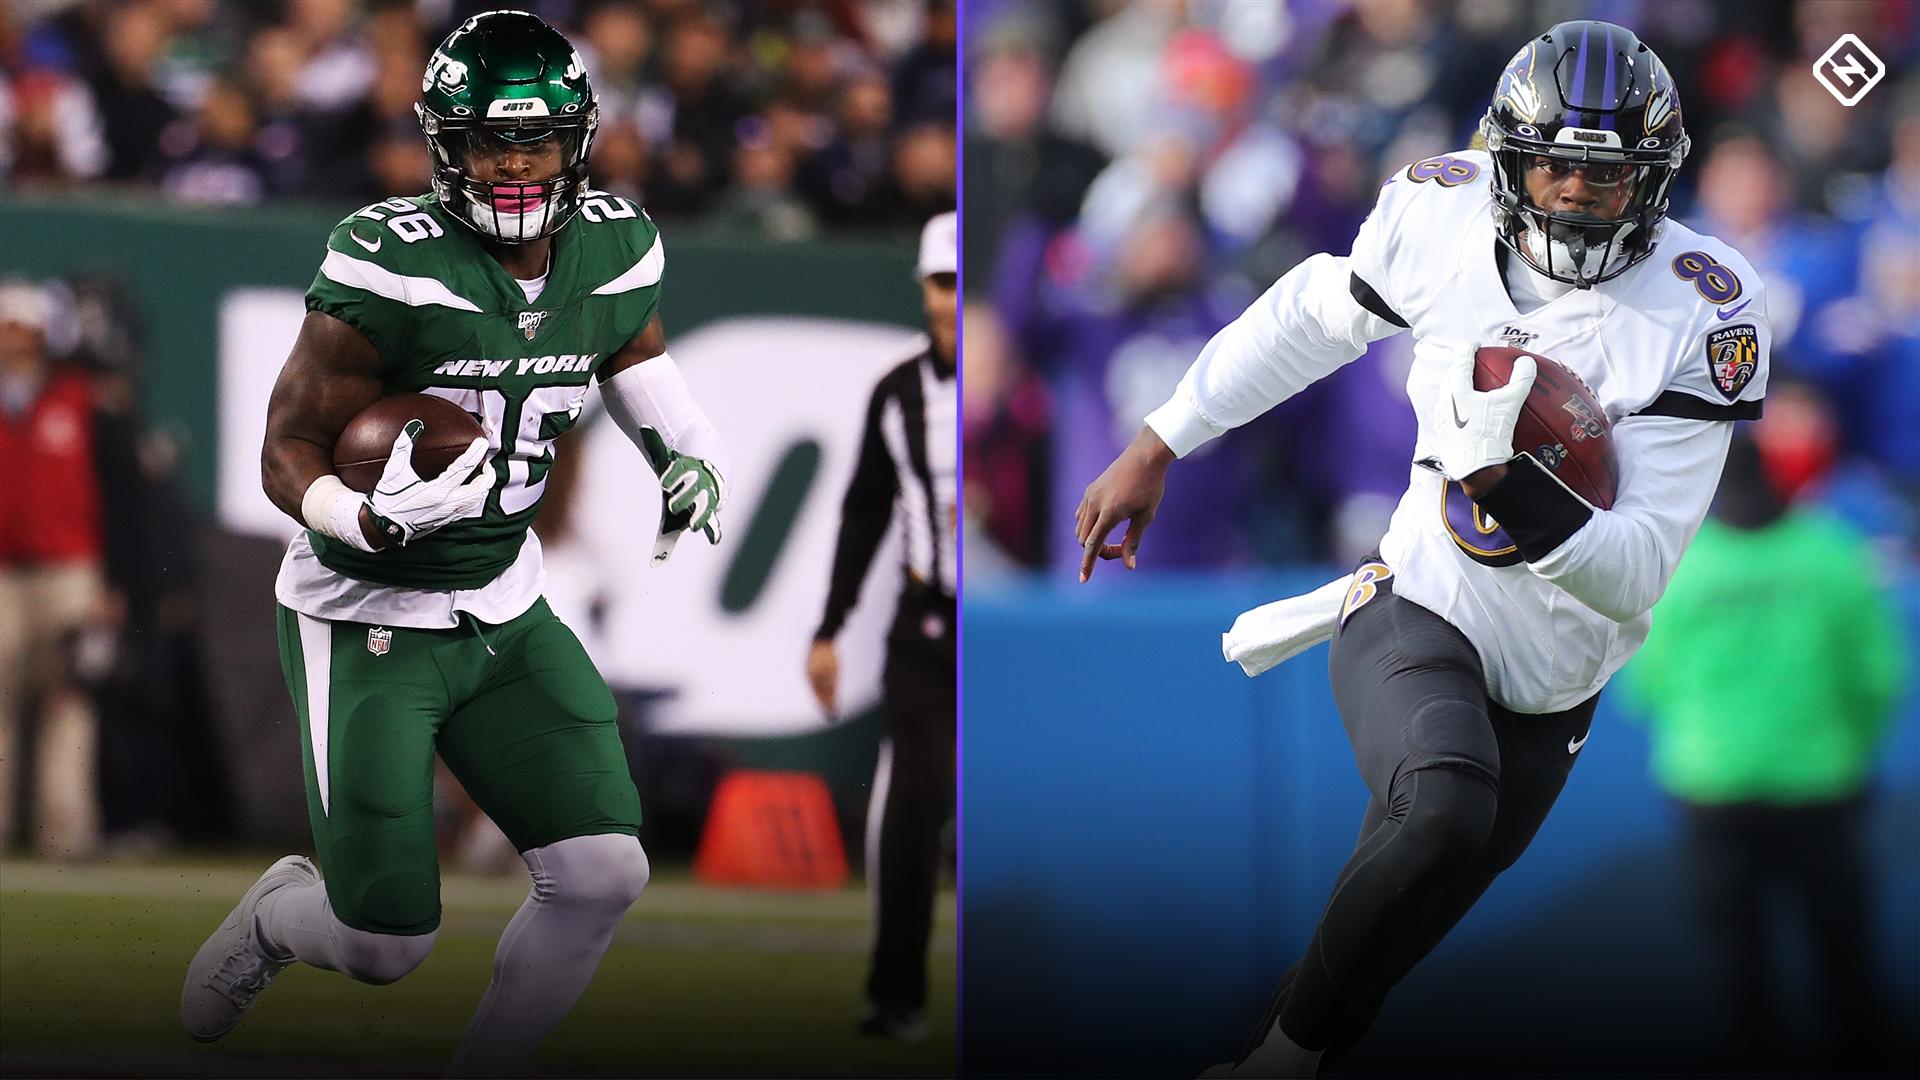 Jets Vs Ravens Fantasy Football Start Em Sit Em For Thursday Night Football Watch the new york jets vs. yahoo sports